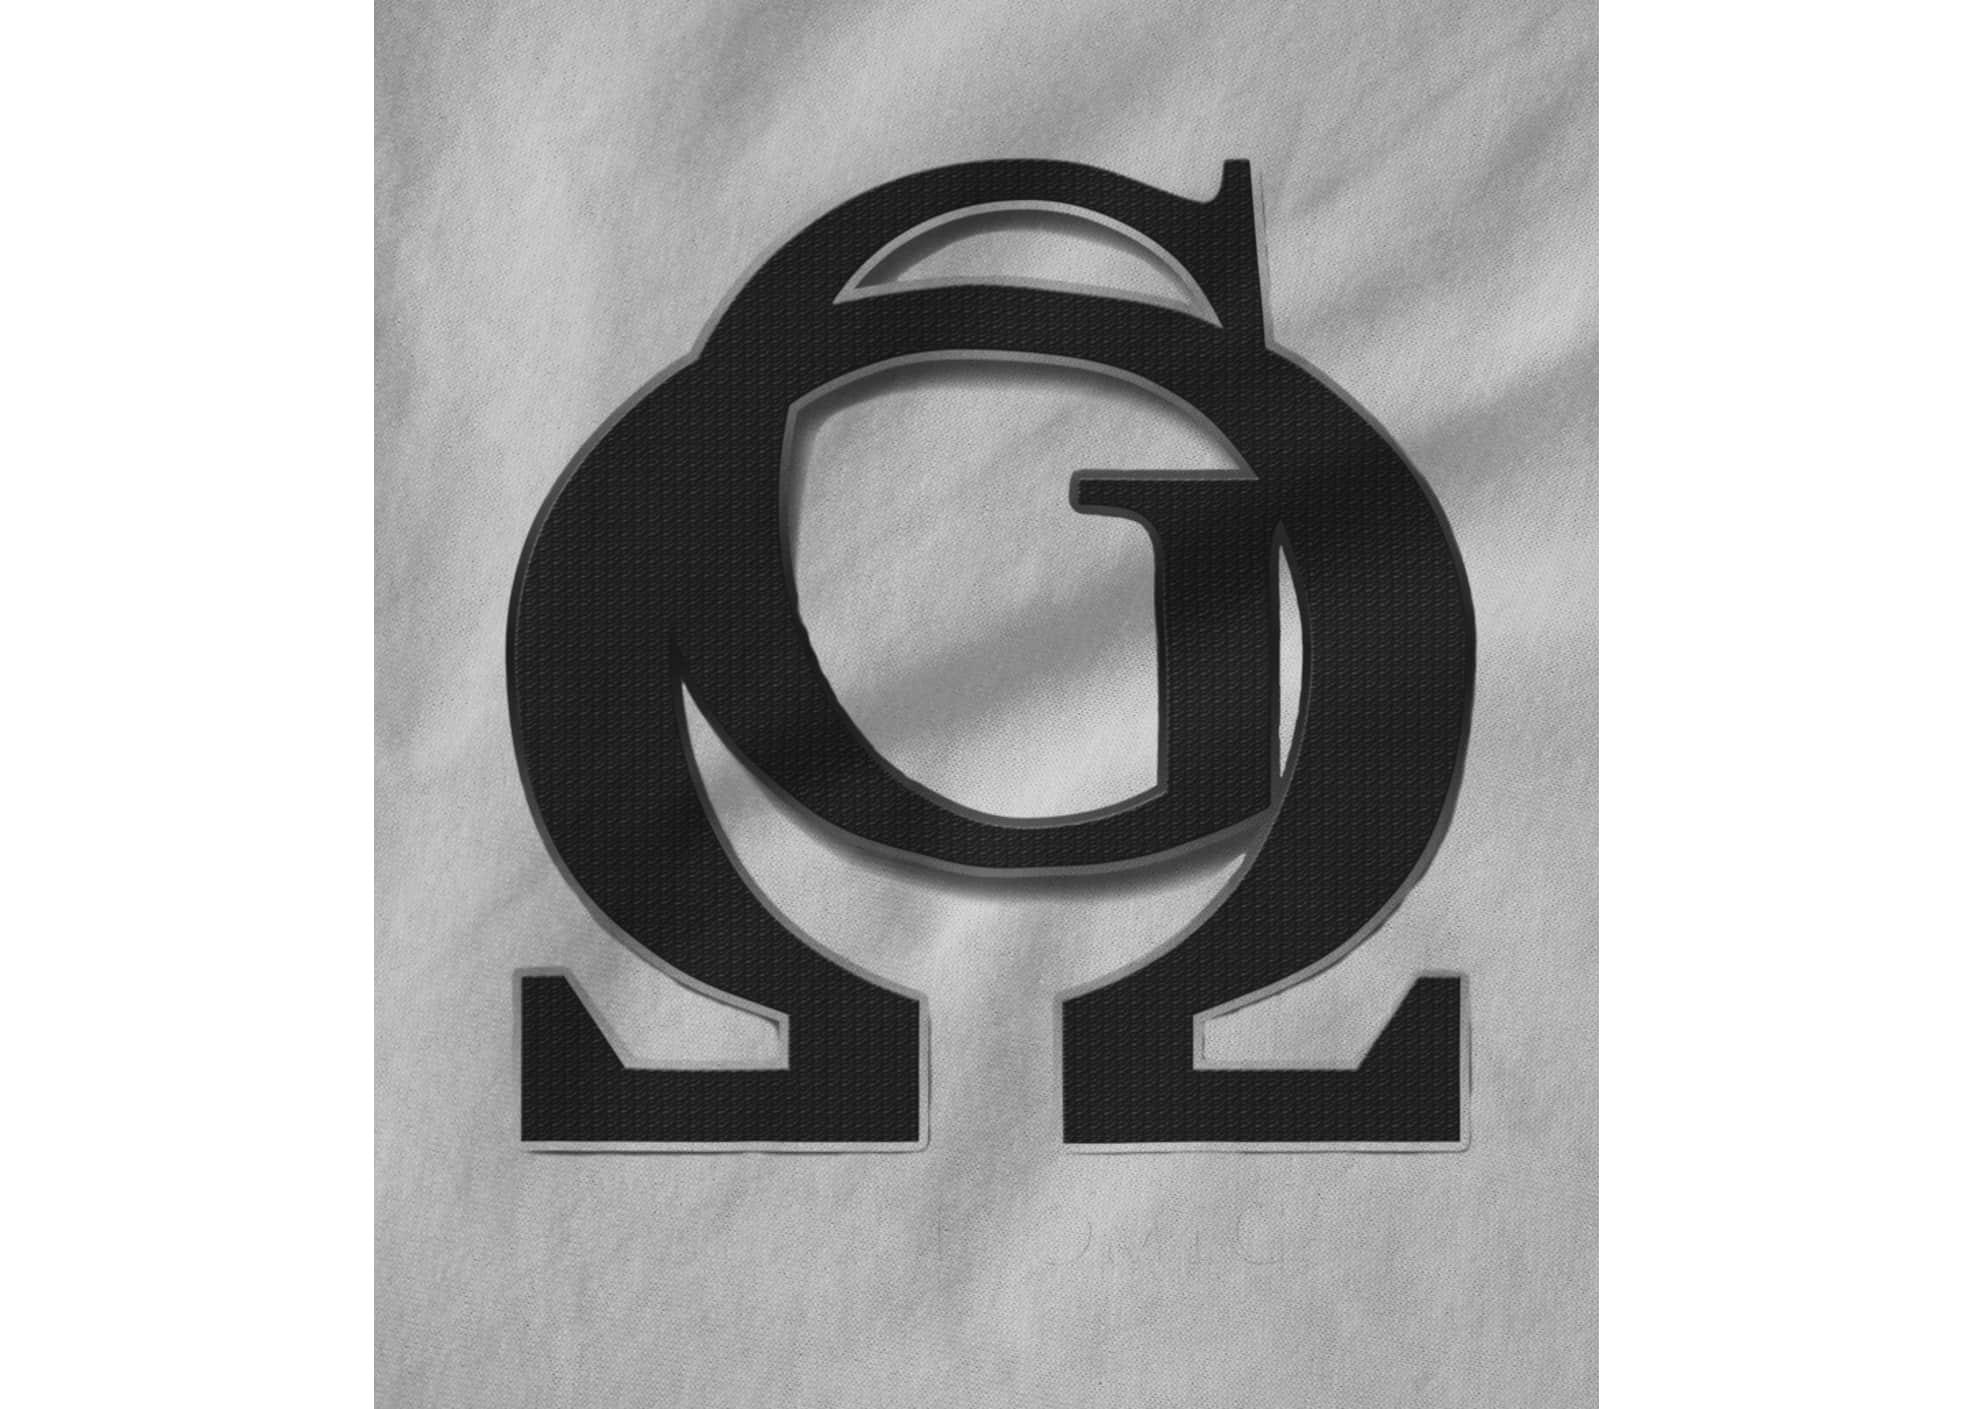 Genesis omega productions genesis omega wht 1494294425